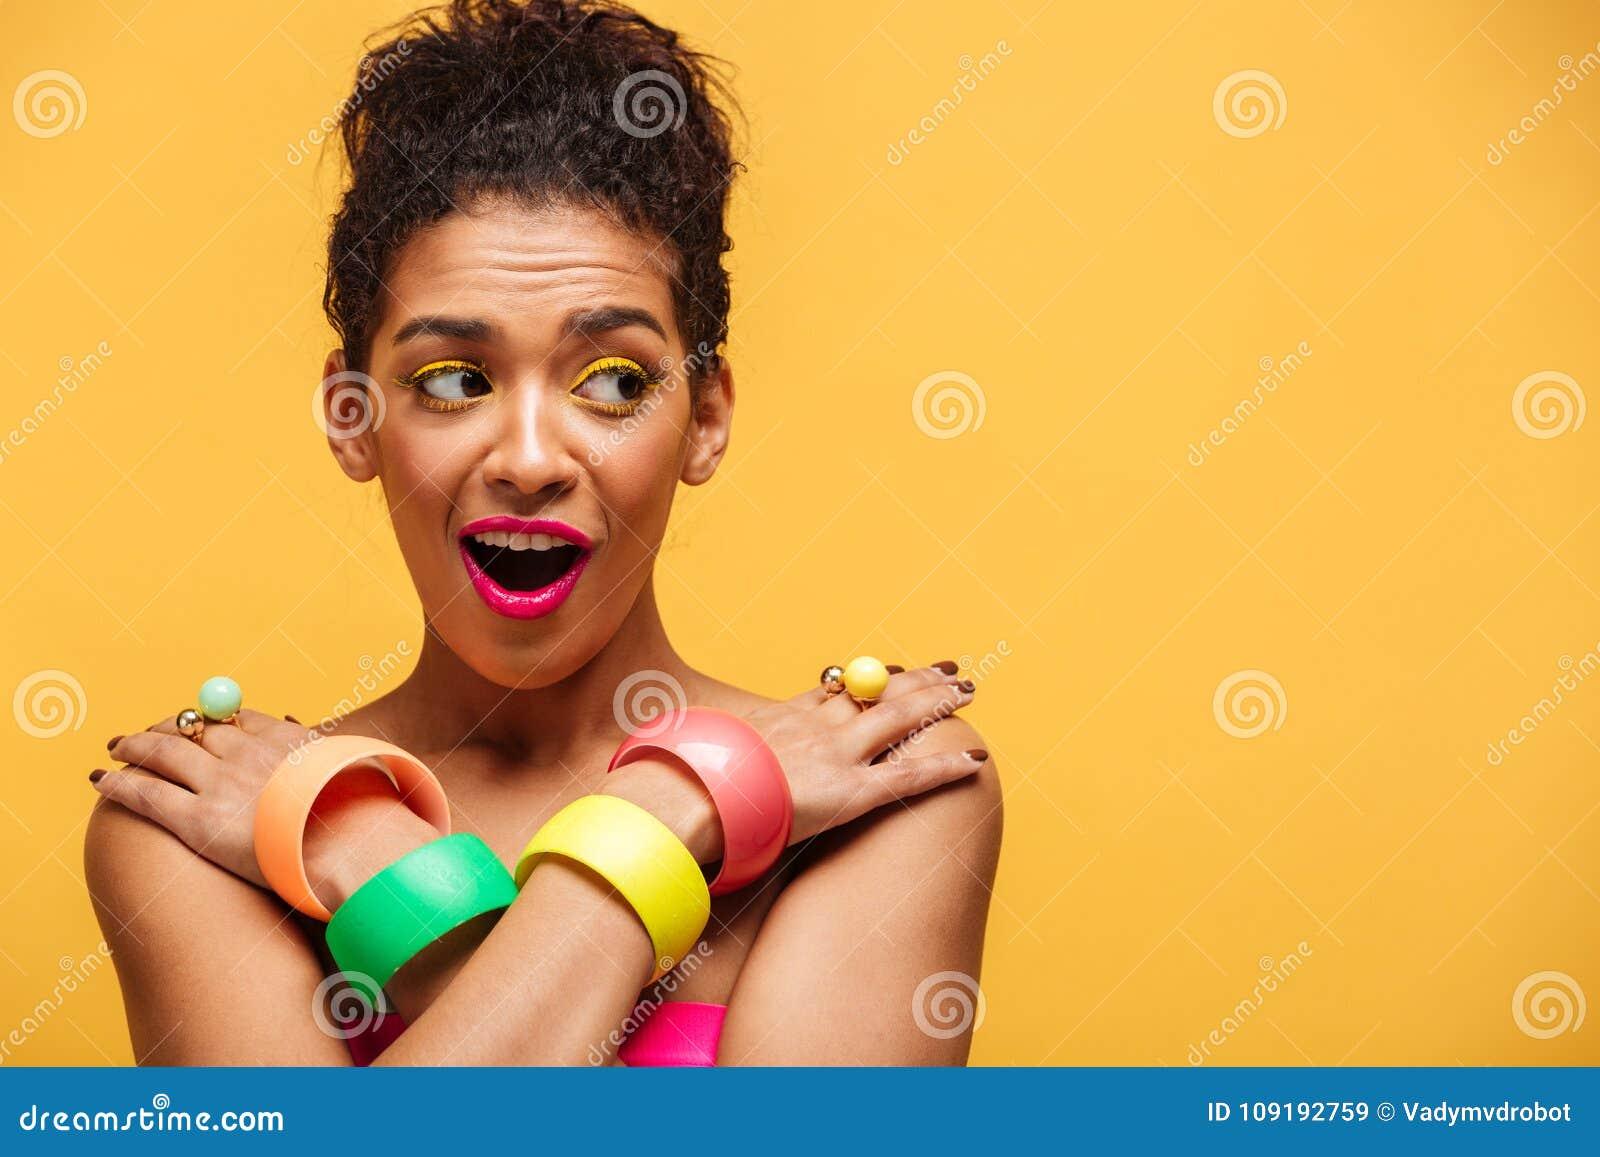 Bikini Results Woman Image Nude Safesearch Photos